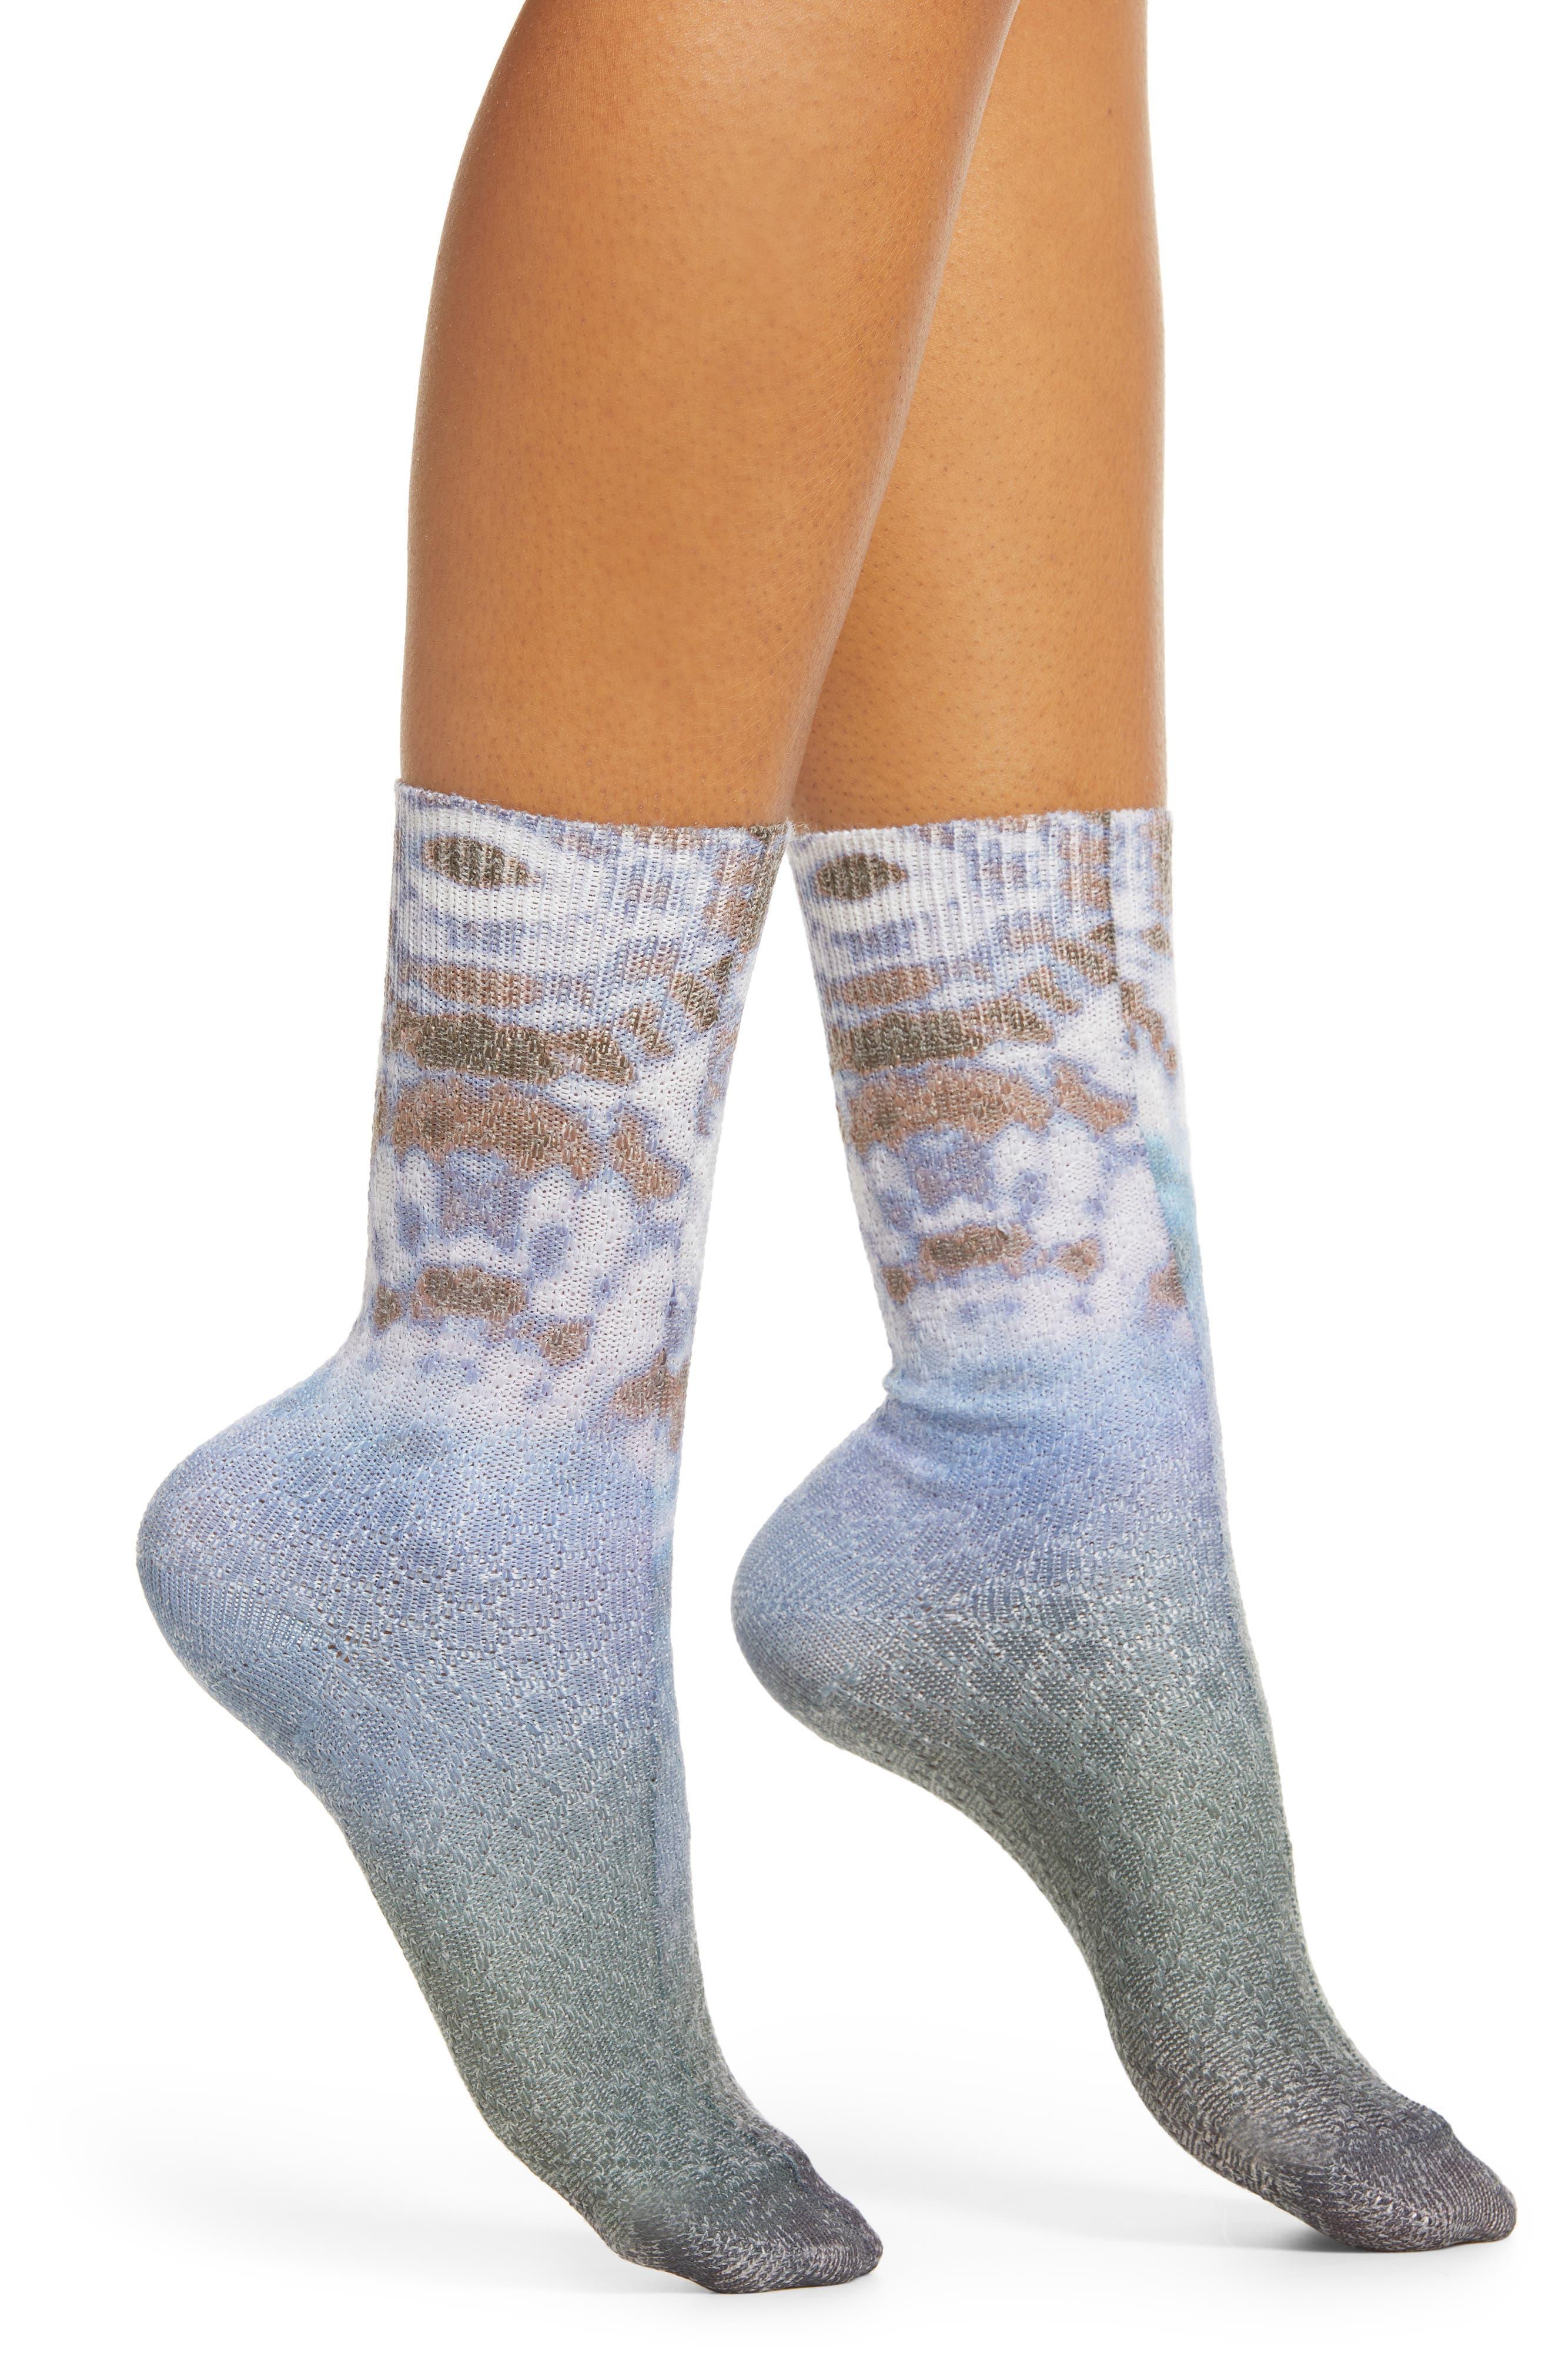 Extrafine Merino Wool Blend Socks